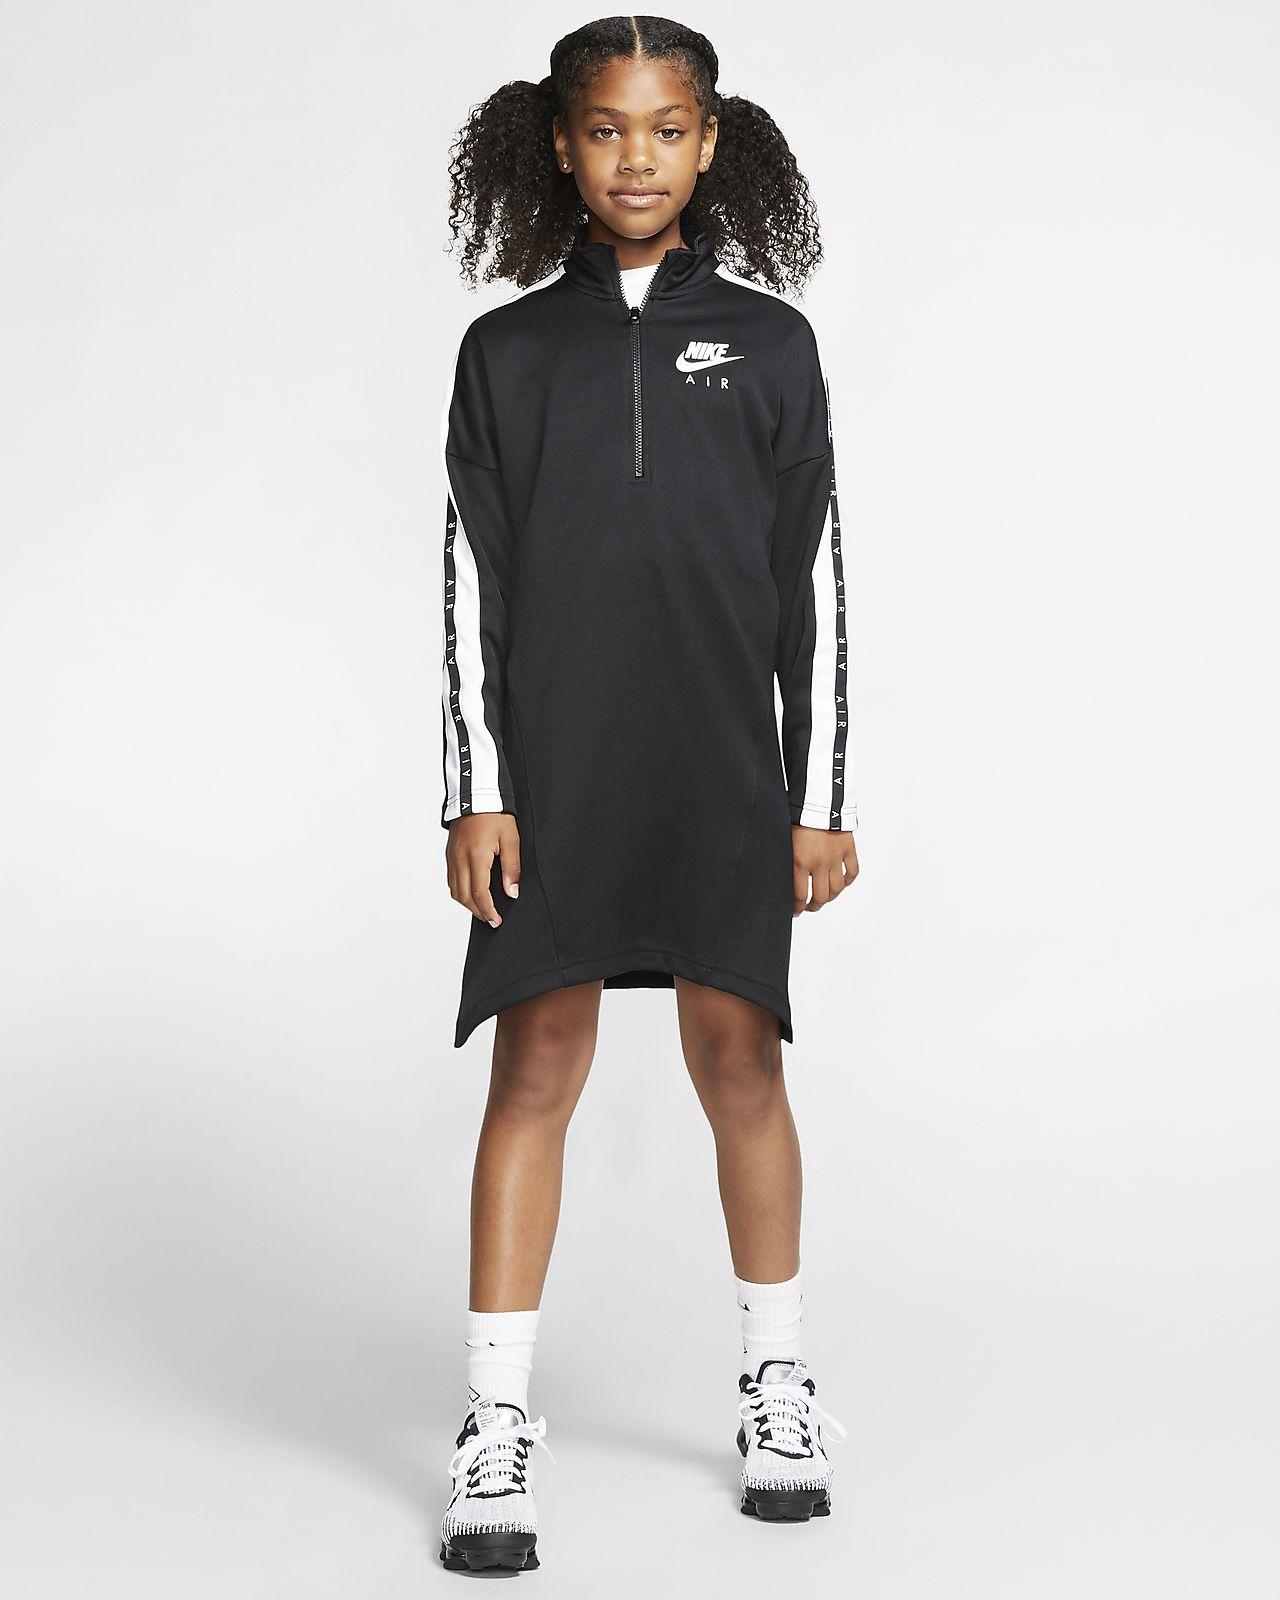 Abito Nike Air - Ragazza